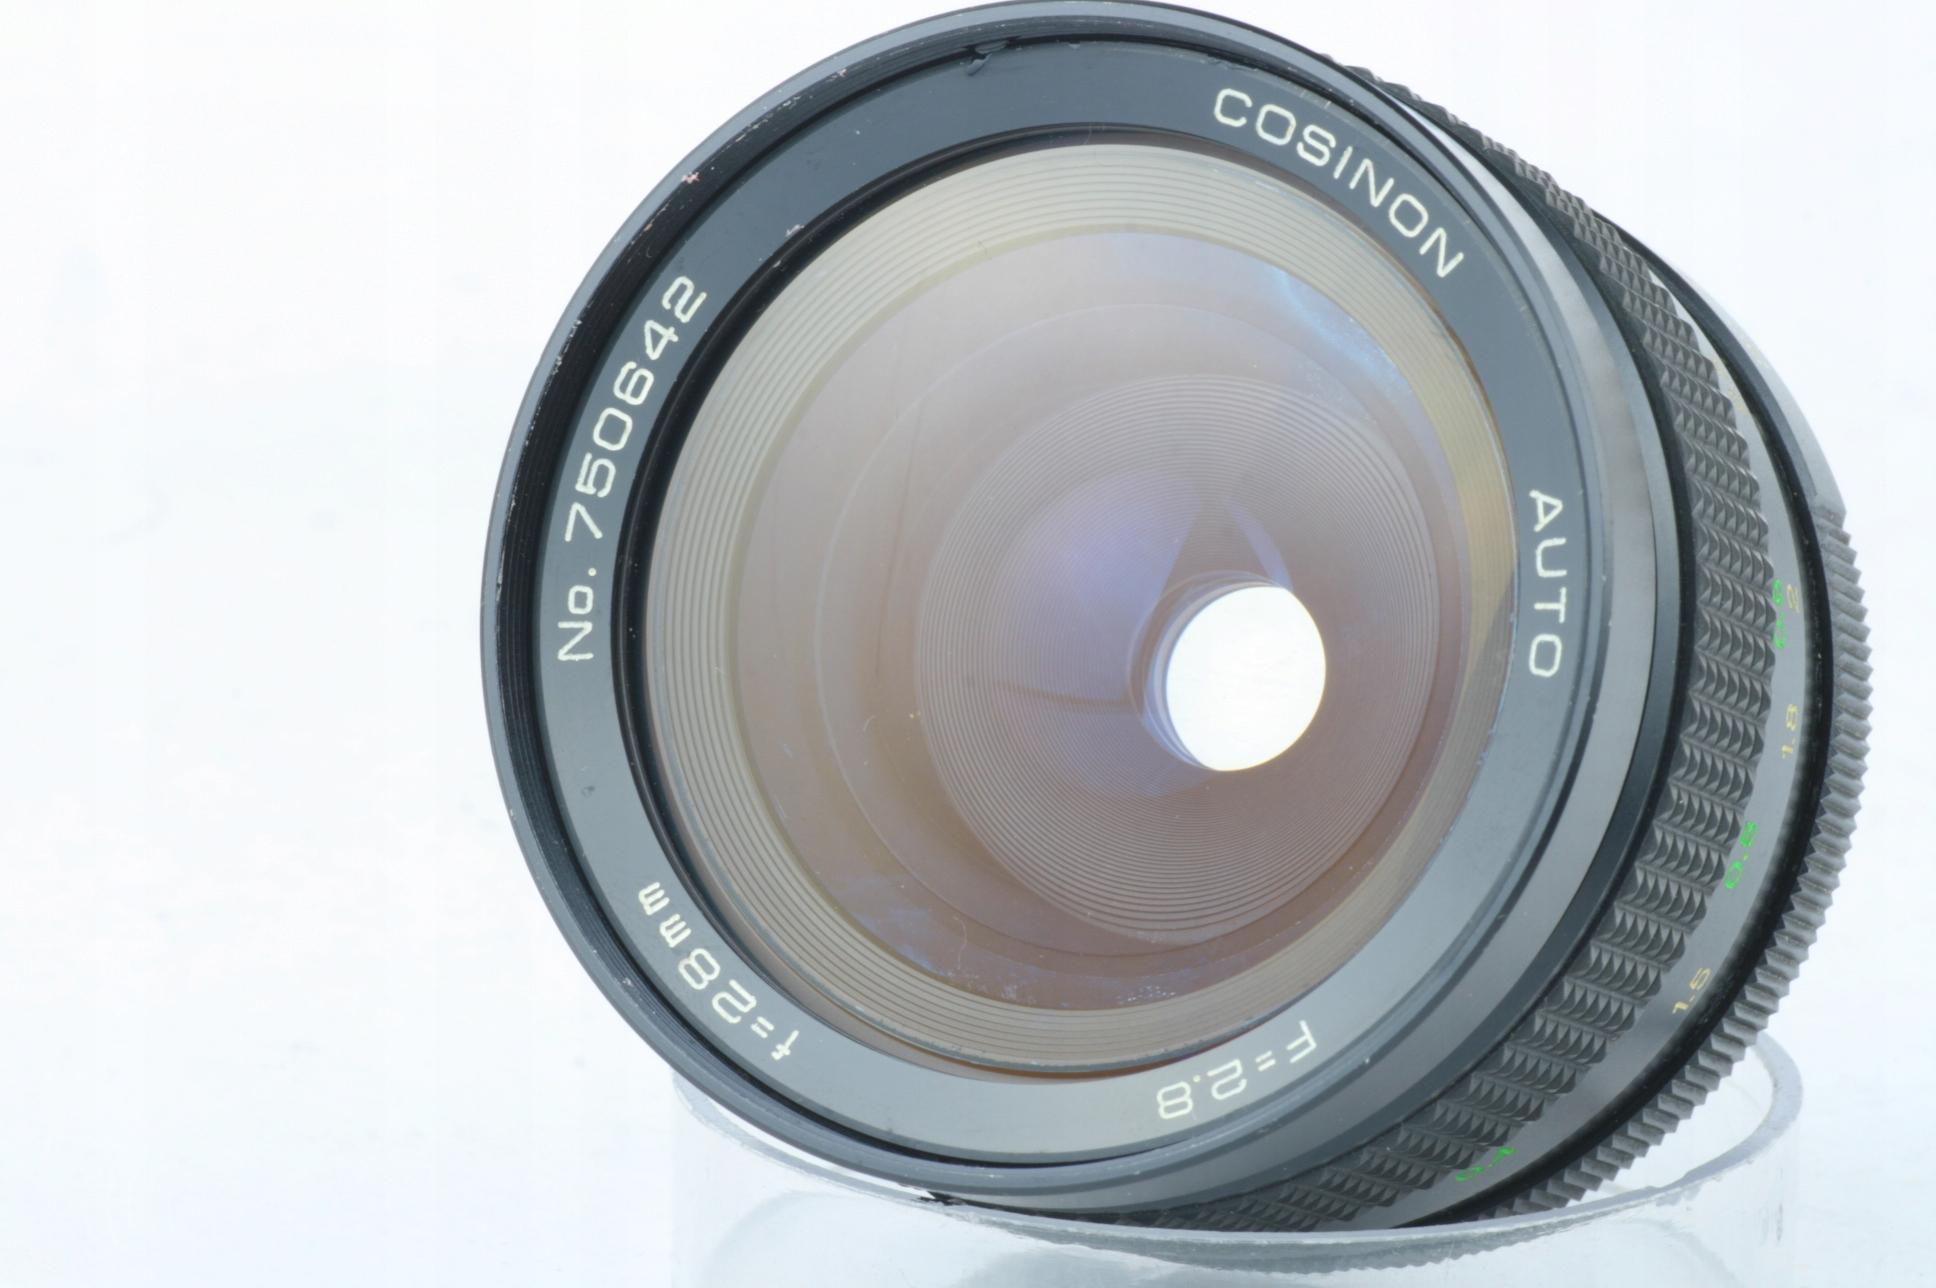 szeroki kąt COSINON 1:2 8 f=28mm COSINA JAPAN - 7737375177